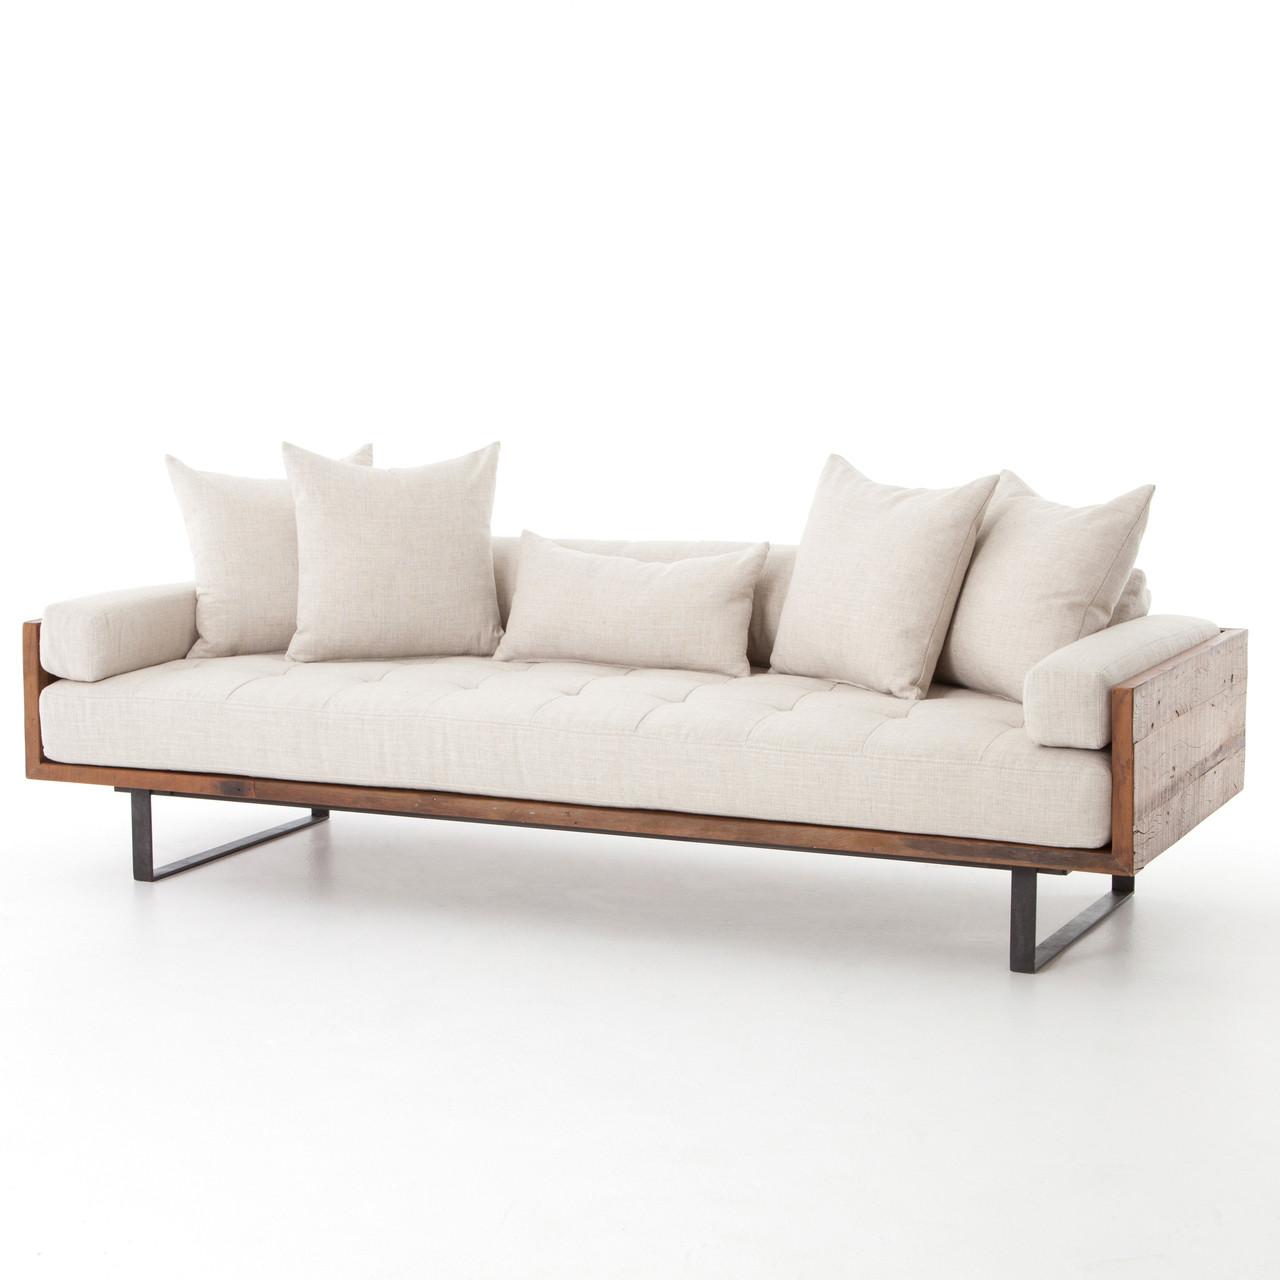 ranger rustic loft natural linen exposed wood sofa zin home. Black Bedroom Furniture Sets. Home Design Ideas